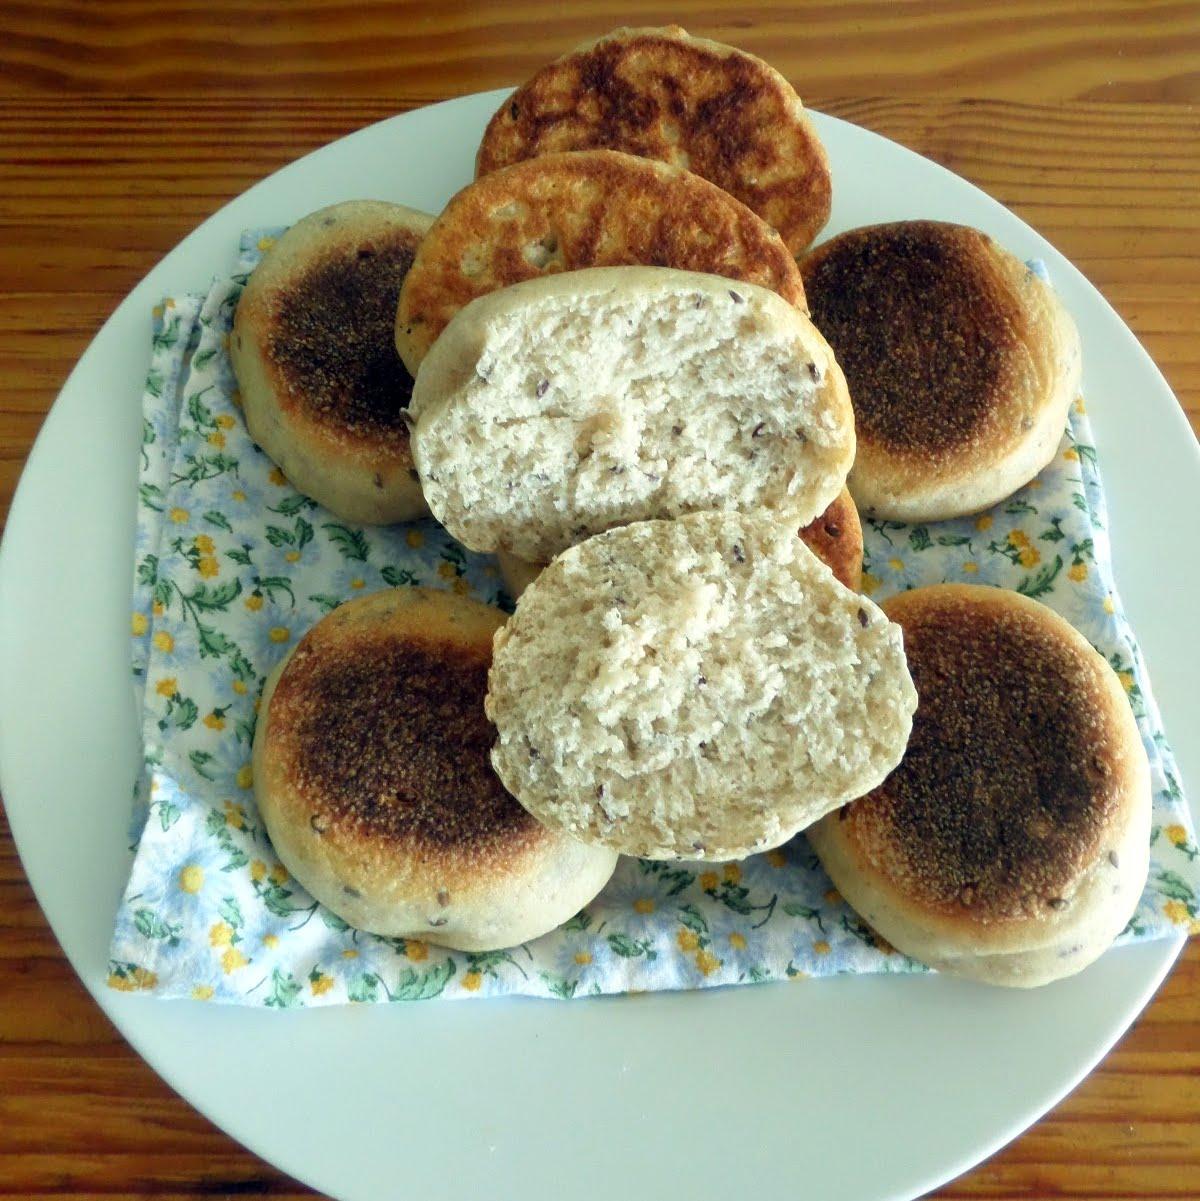 Multigrain English Muffins (Sourdough) | Joybee, What's for Dinner?